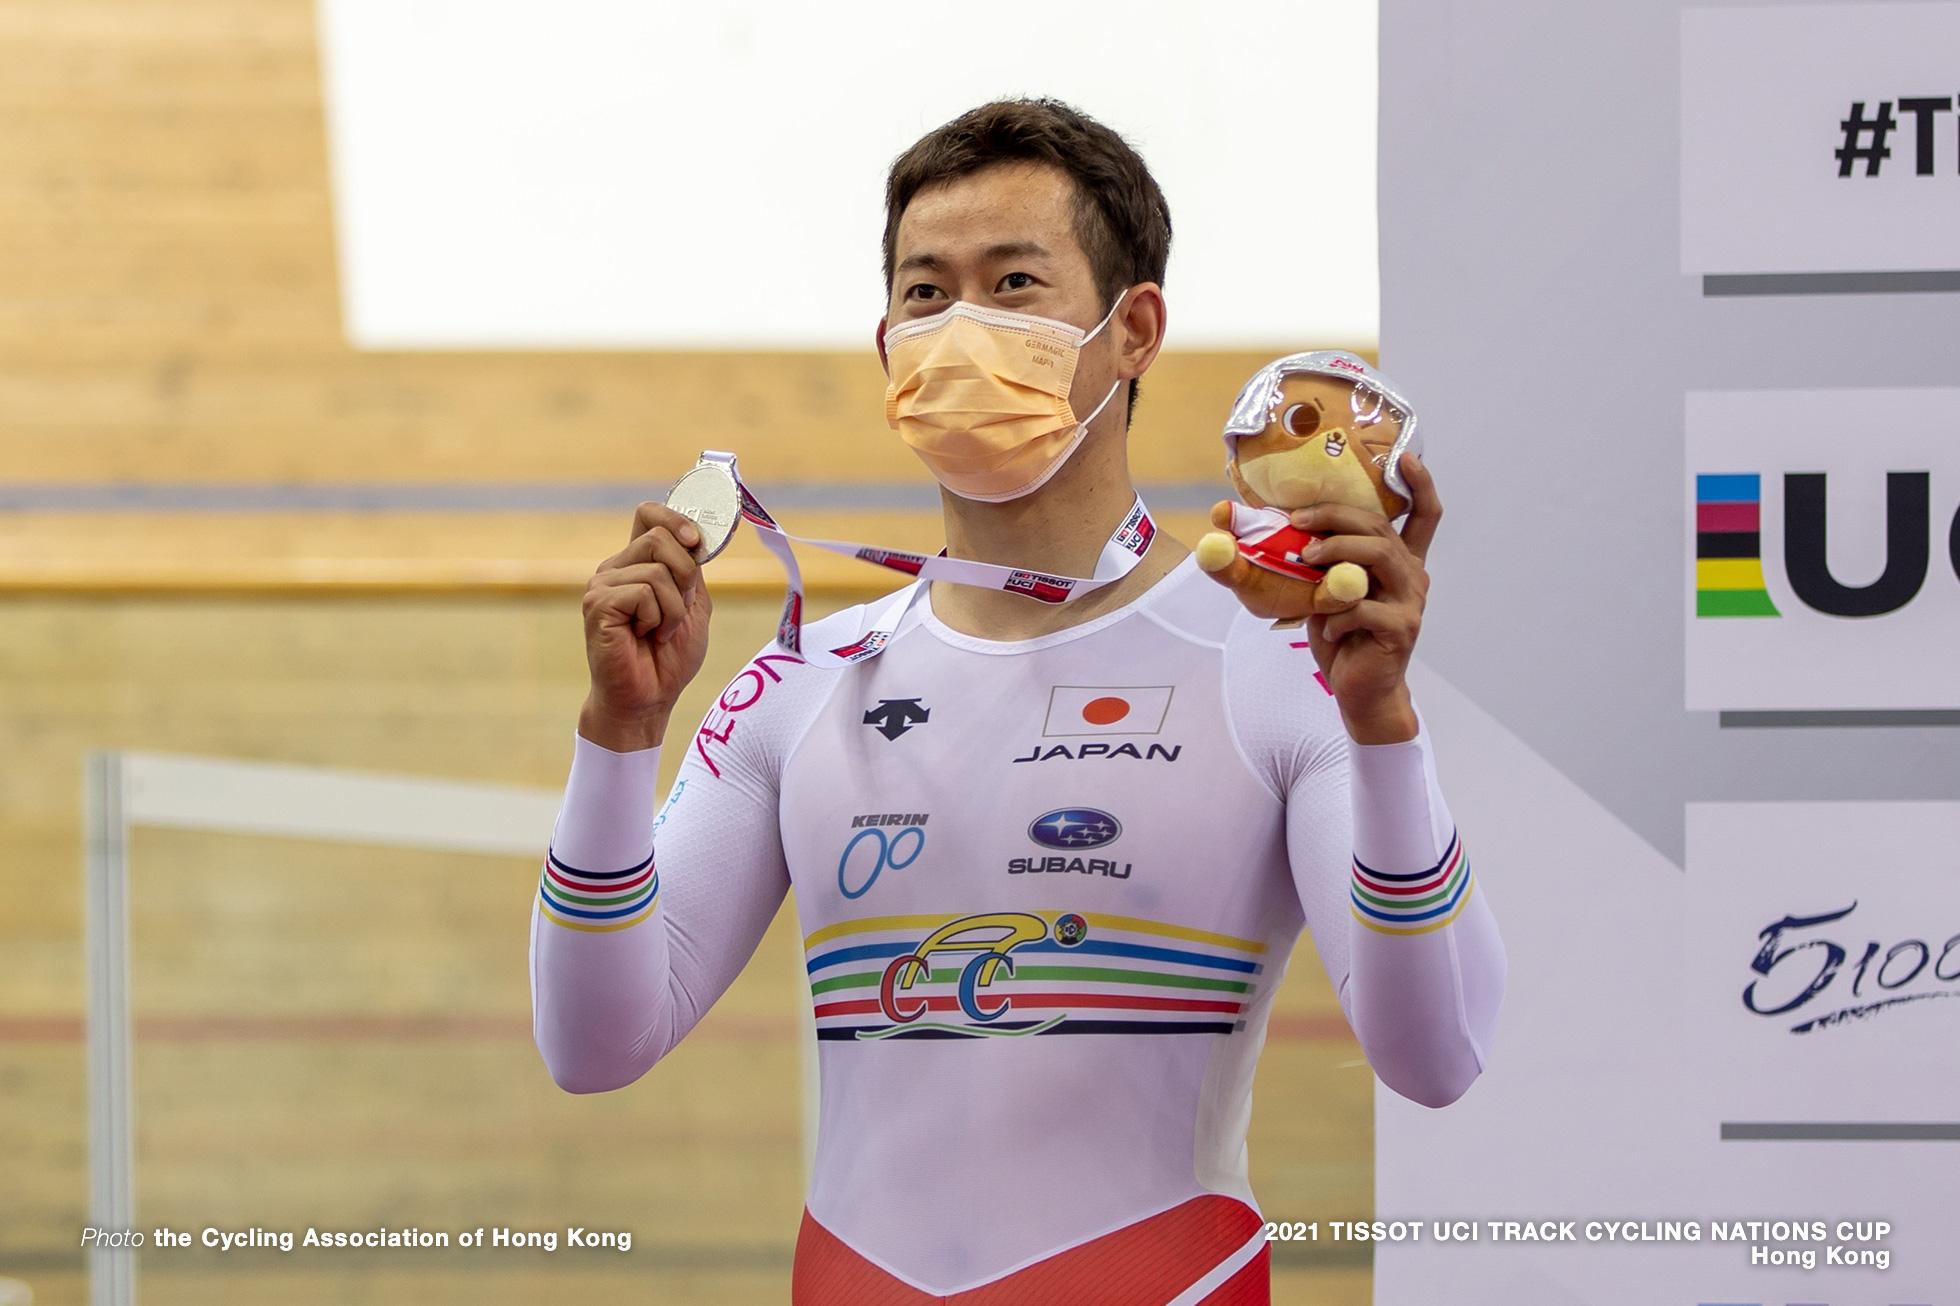 Men's Keirin, TISSOT UCI TRACK CYCLING NATIONS CUP - HONG KONG